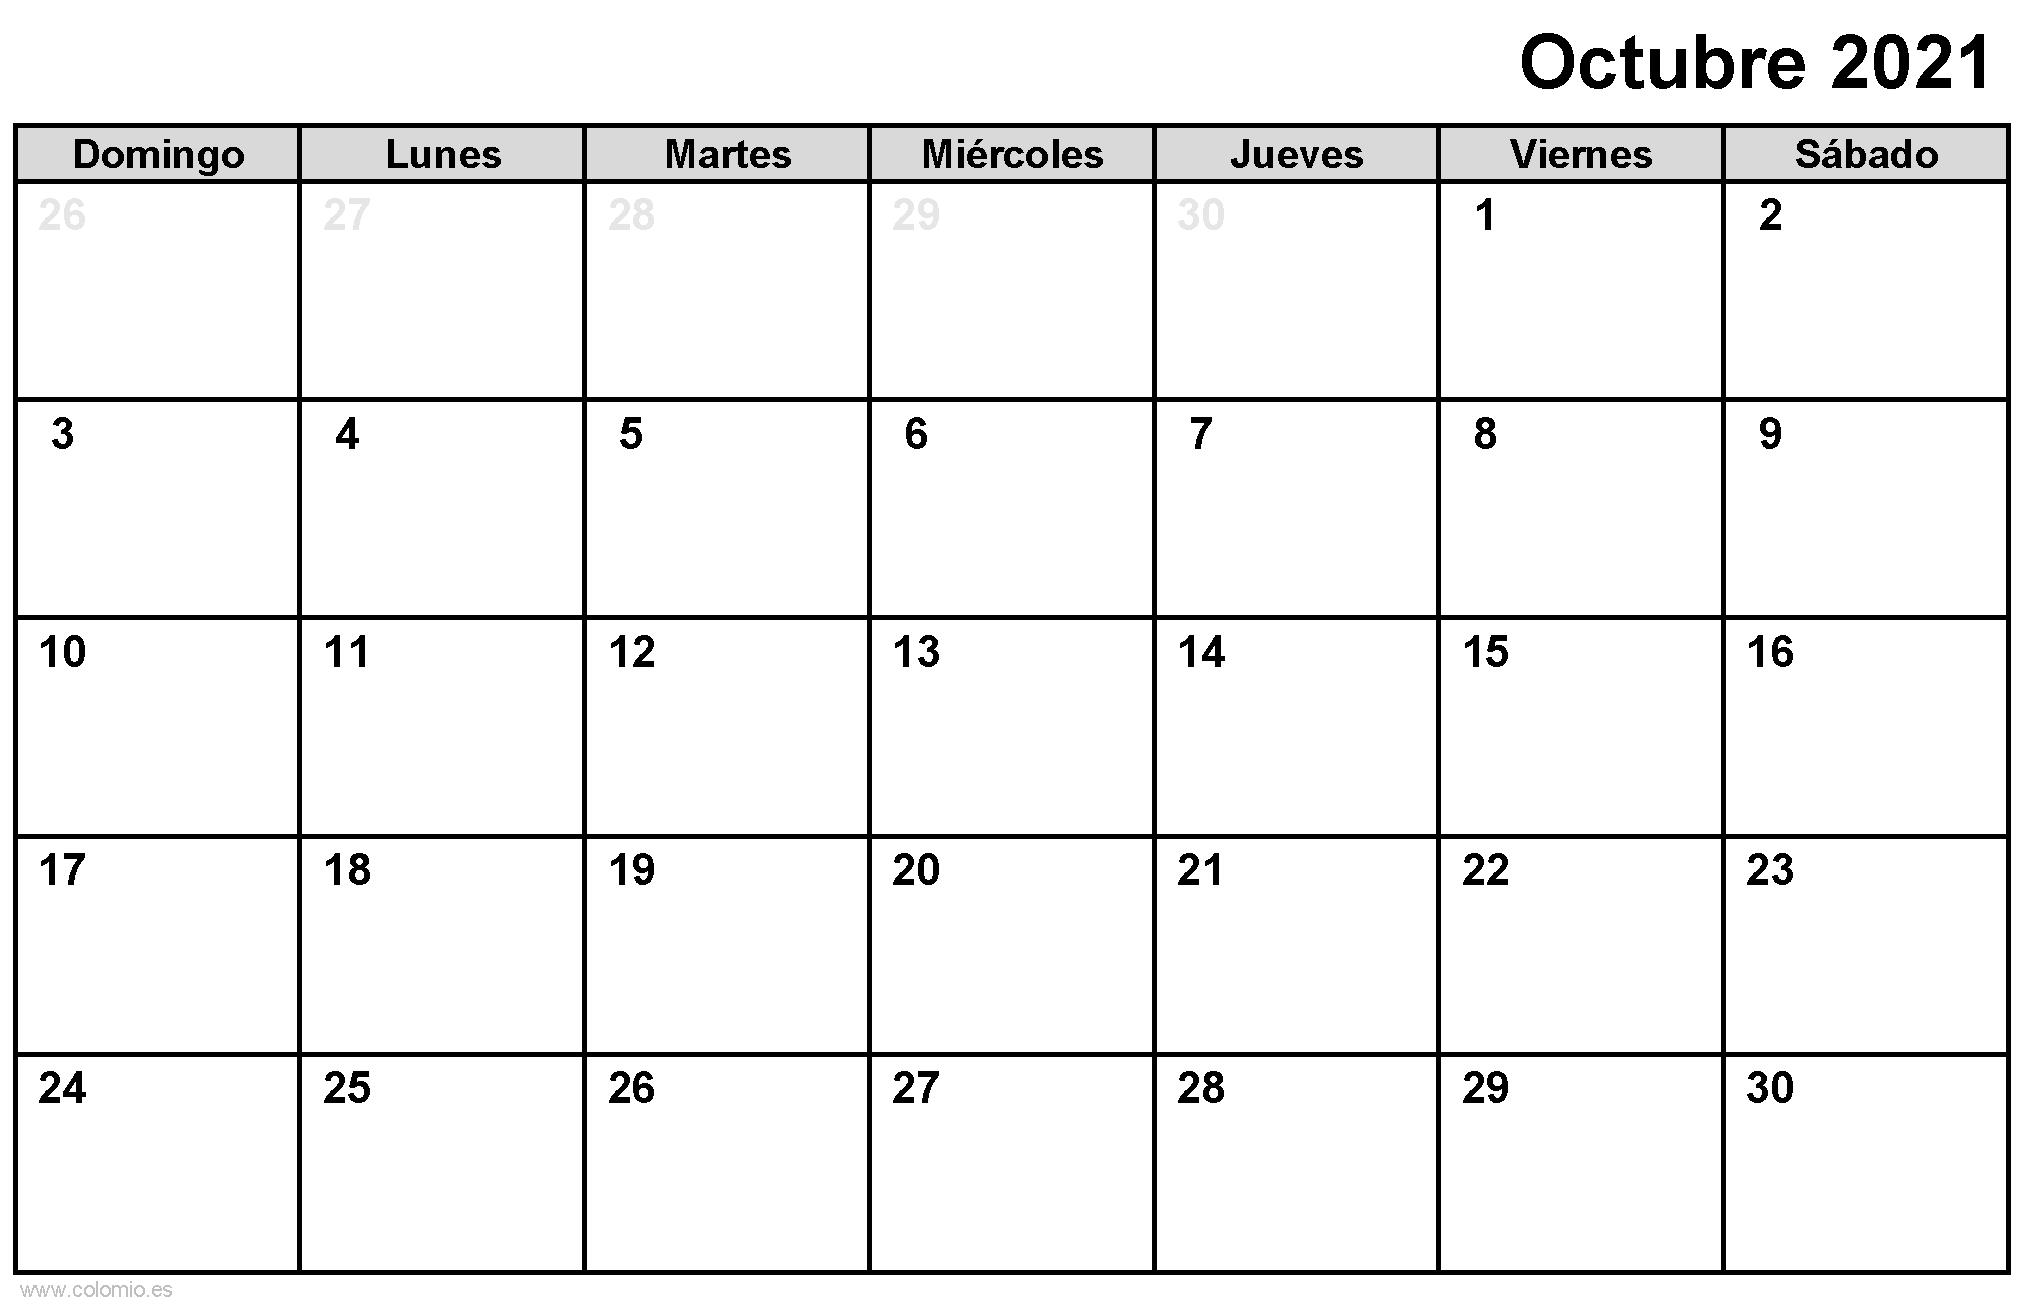 Calendario Octubre 2021 para imprimir